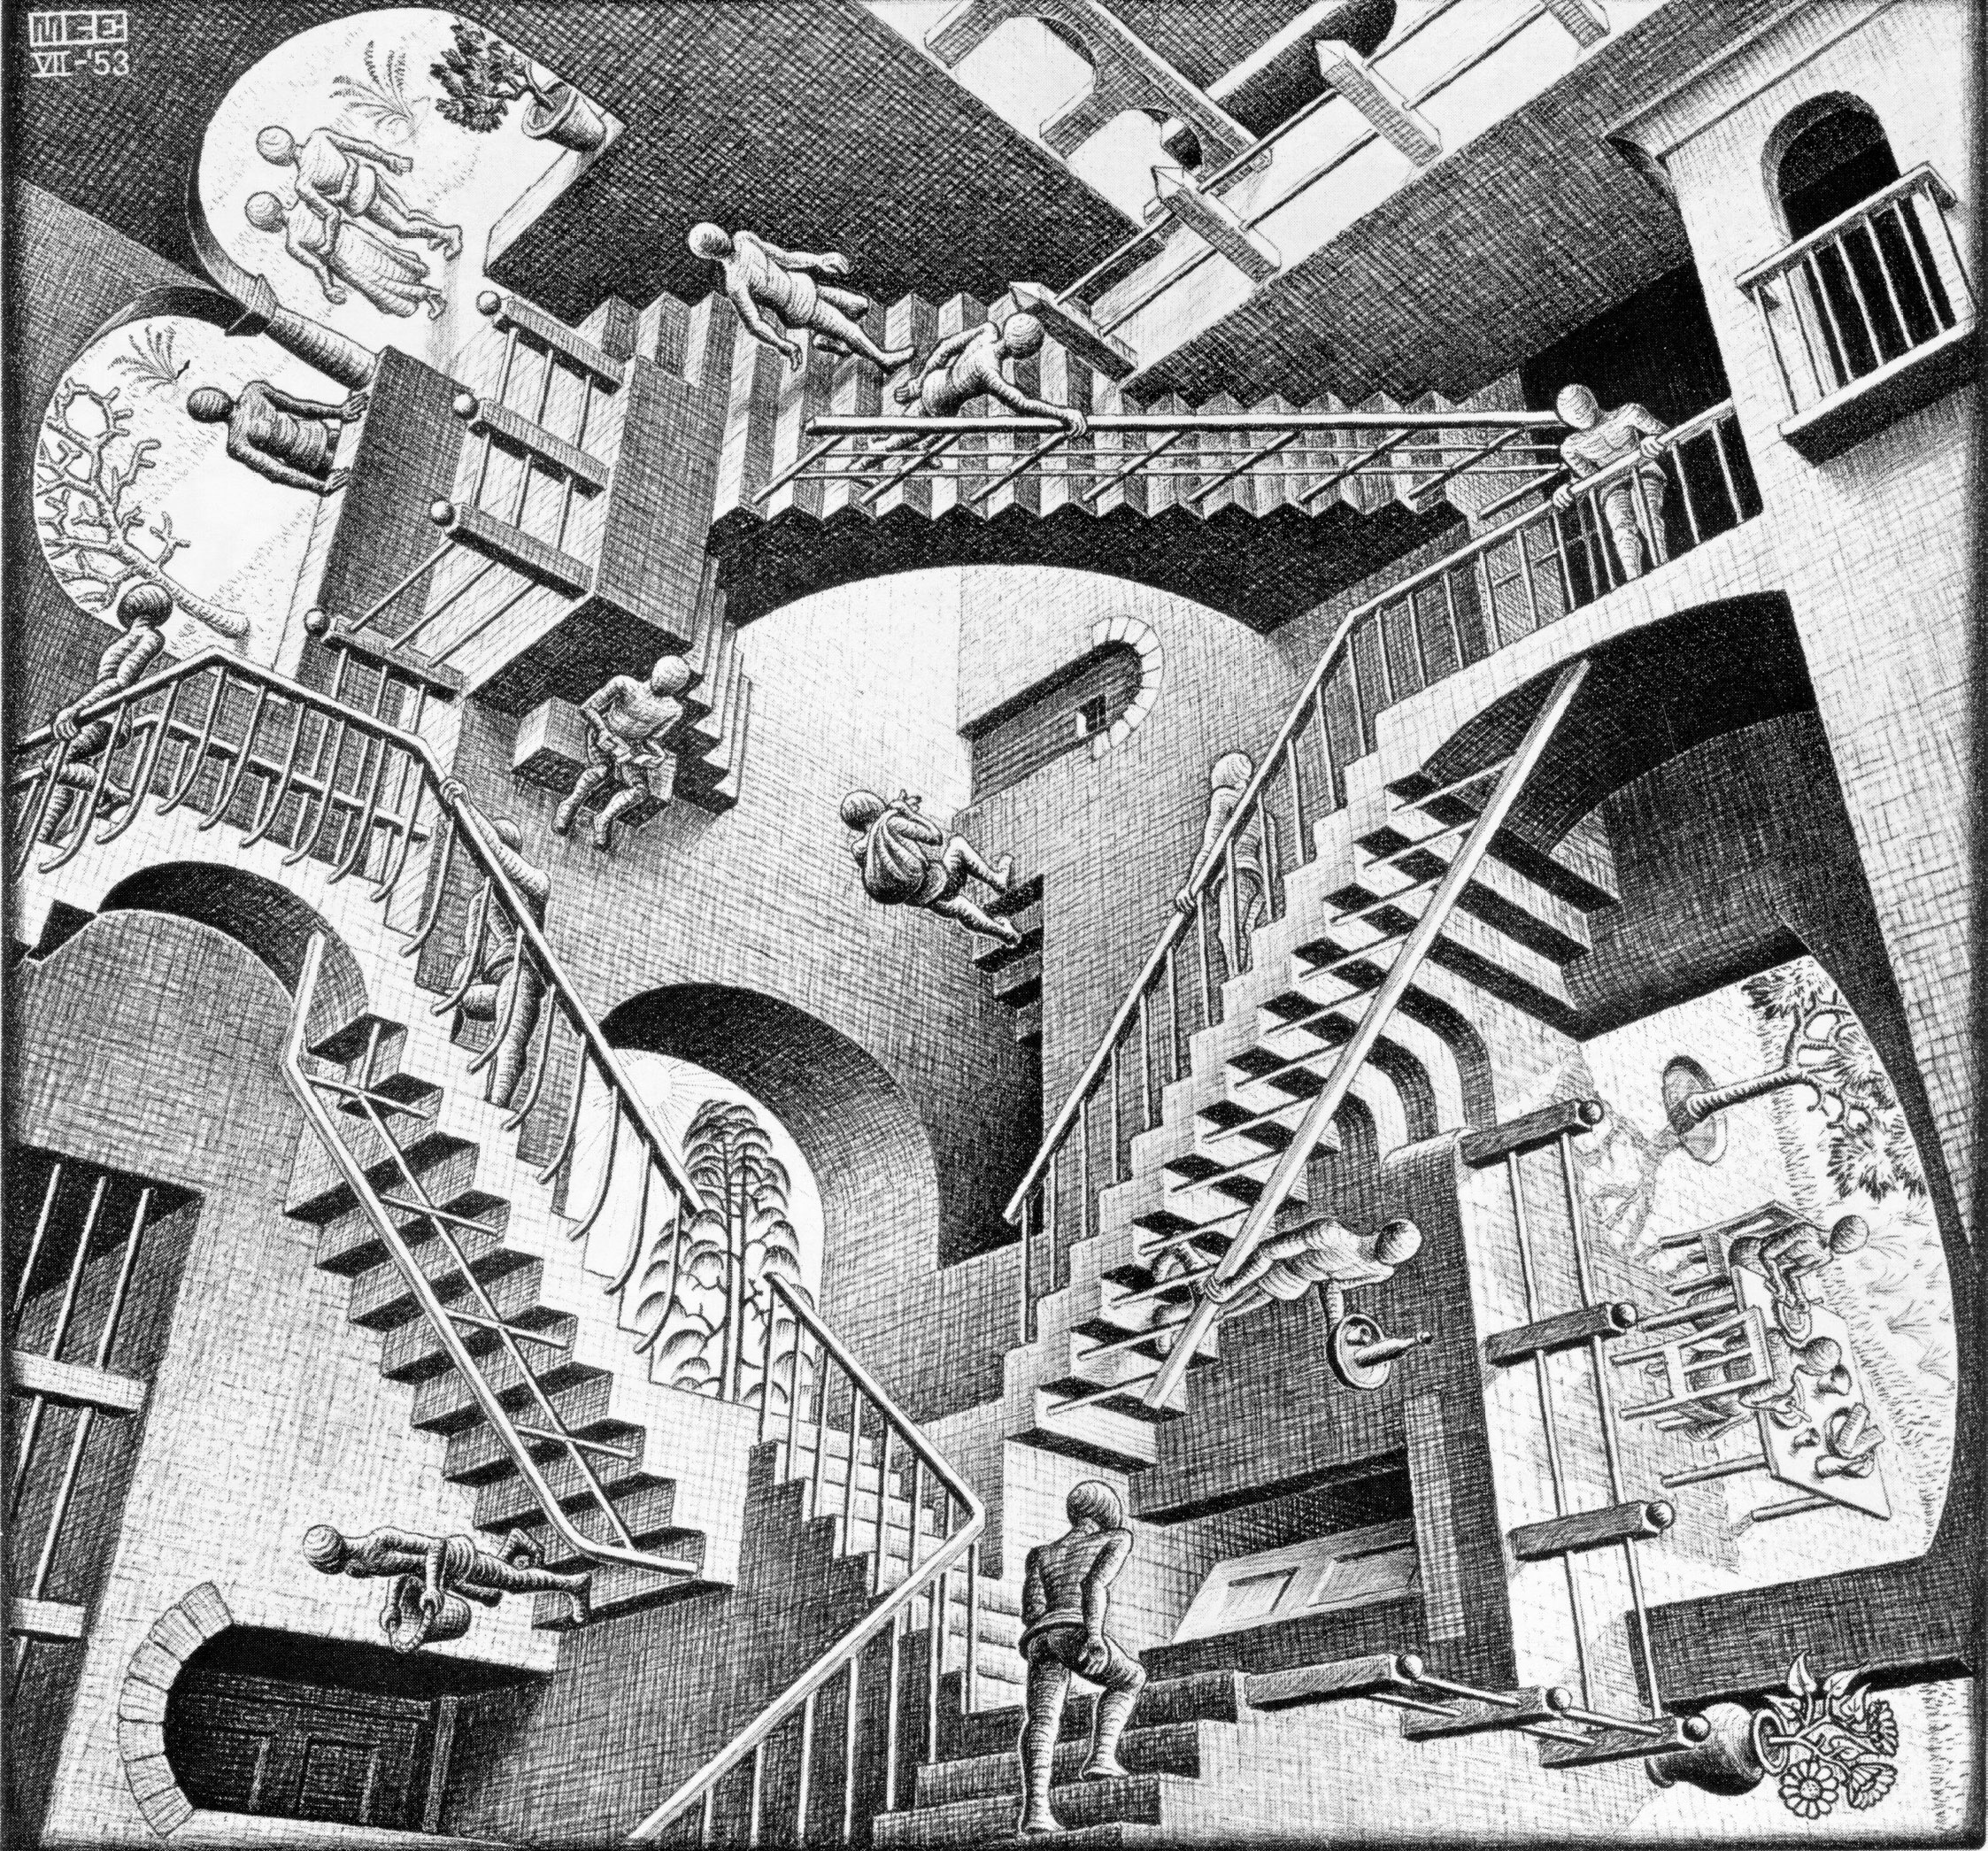 M. C. Escher: Relativita